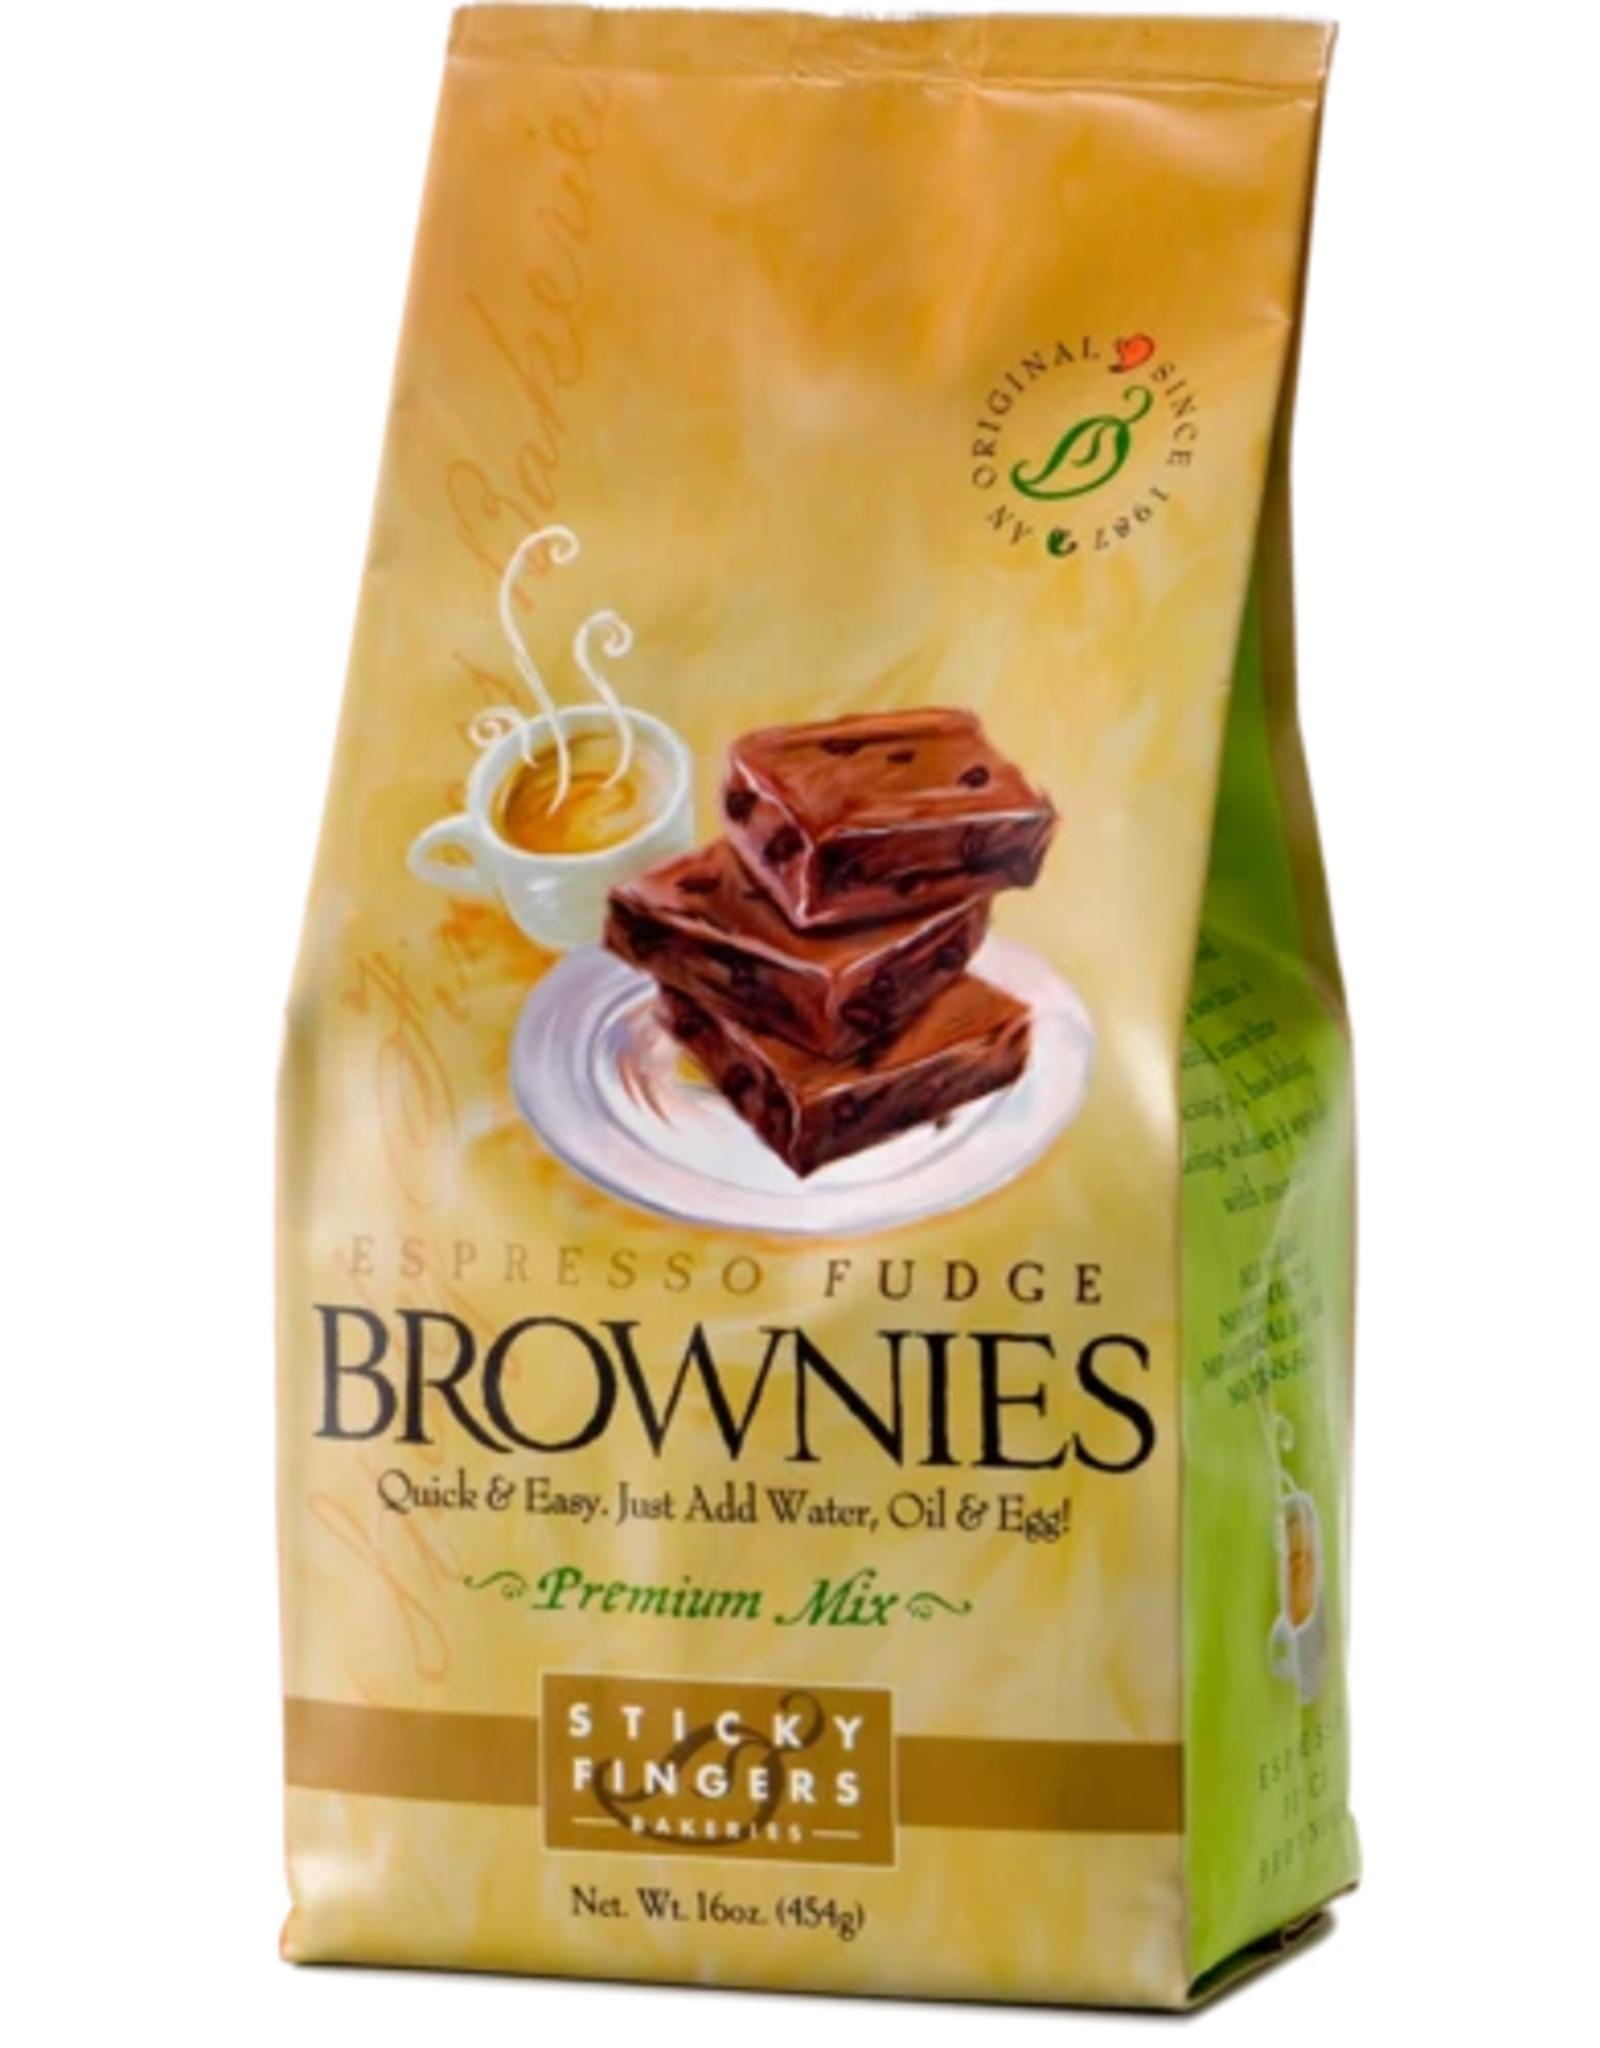 Sticky Fingers Brownies, Espresso Fudge